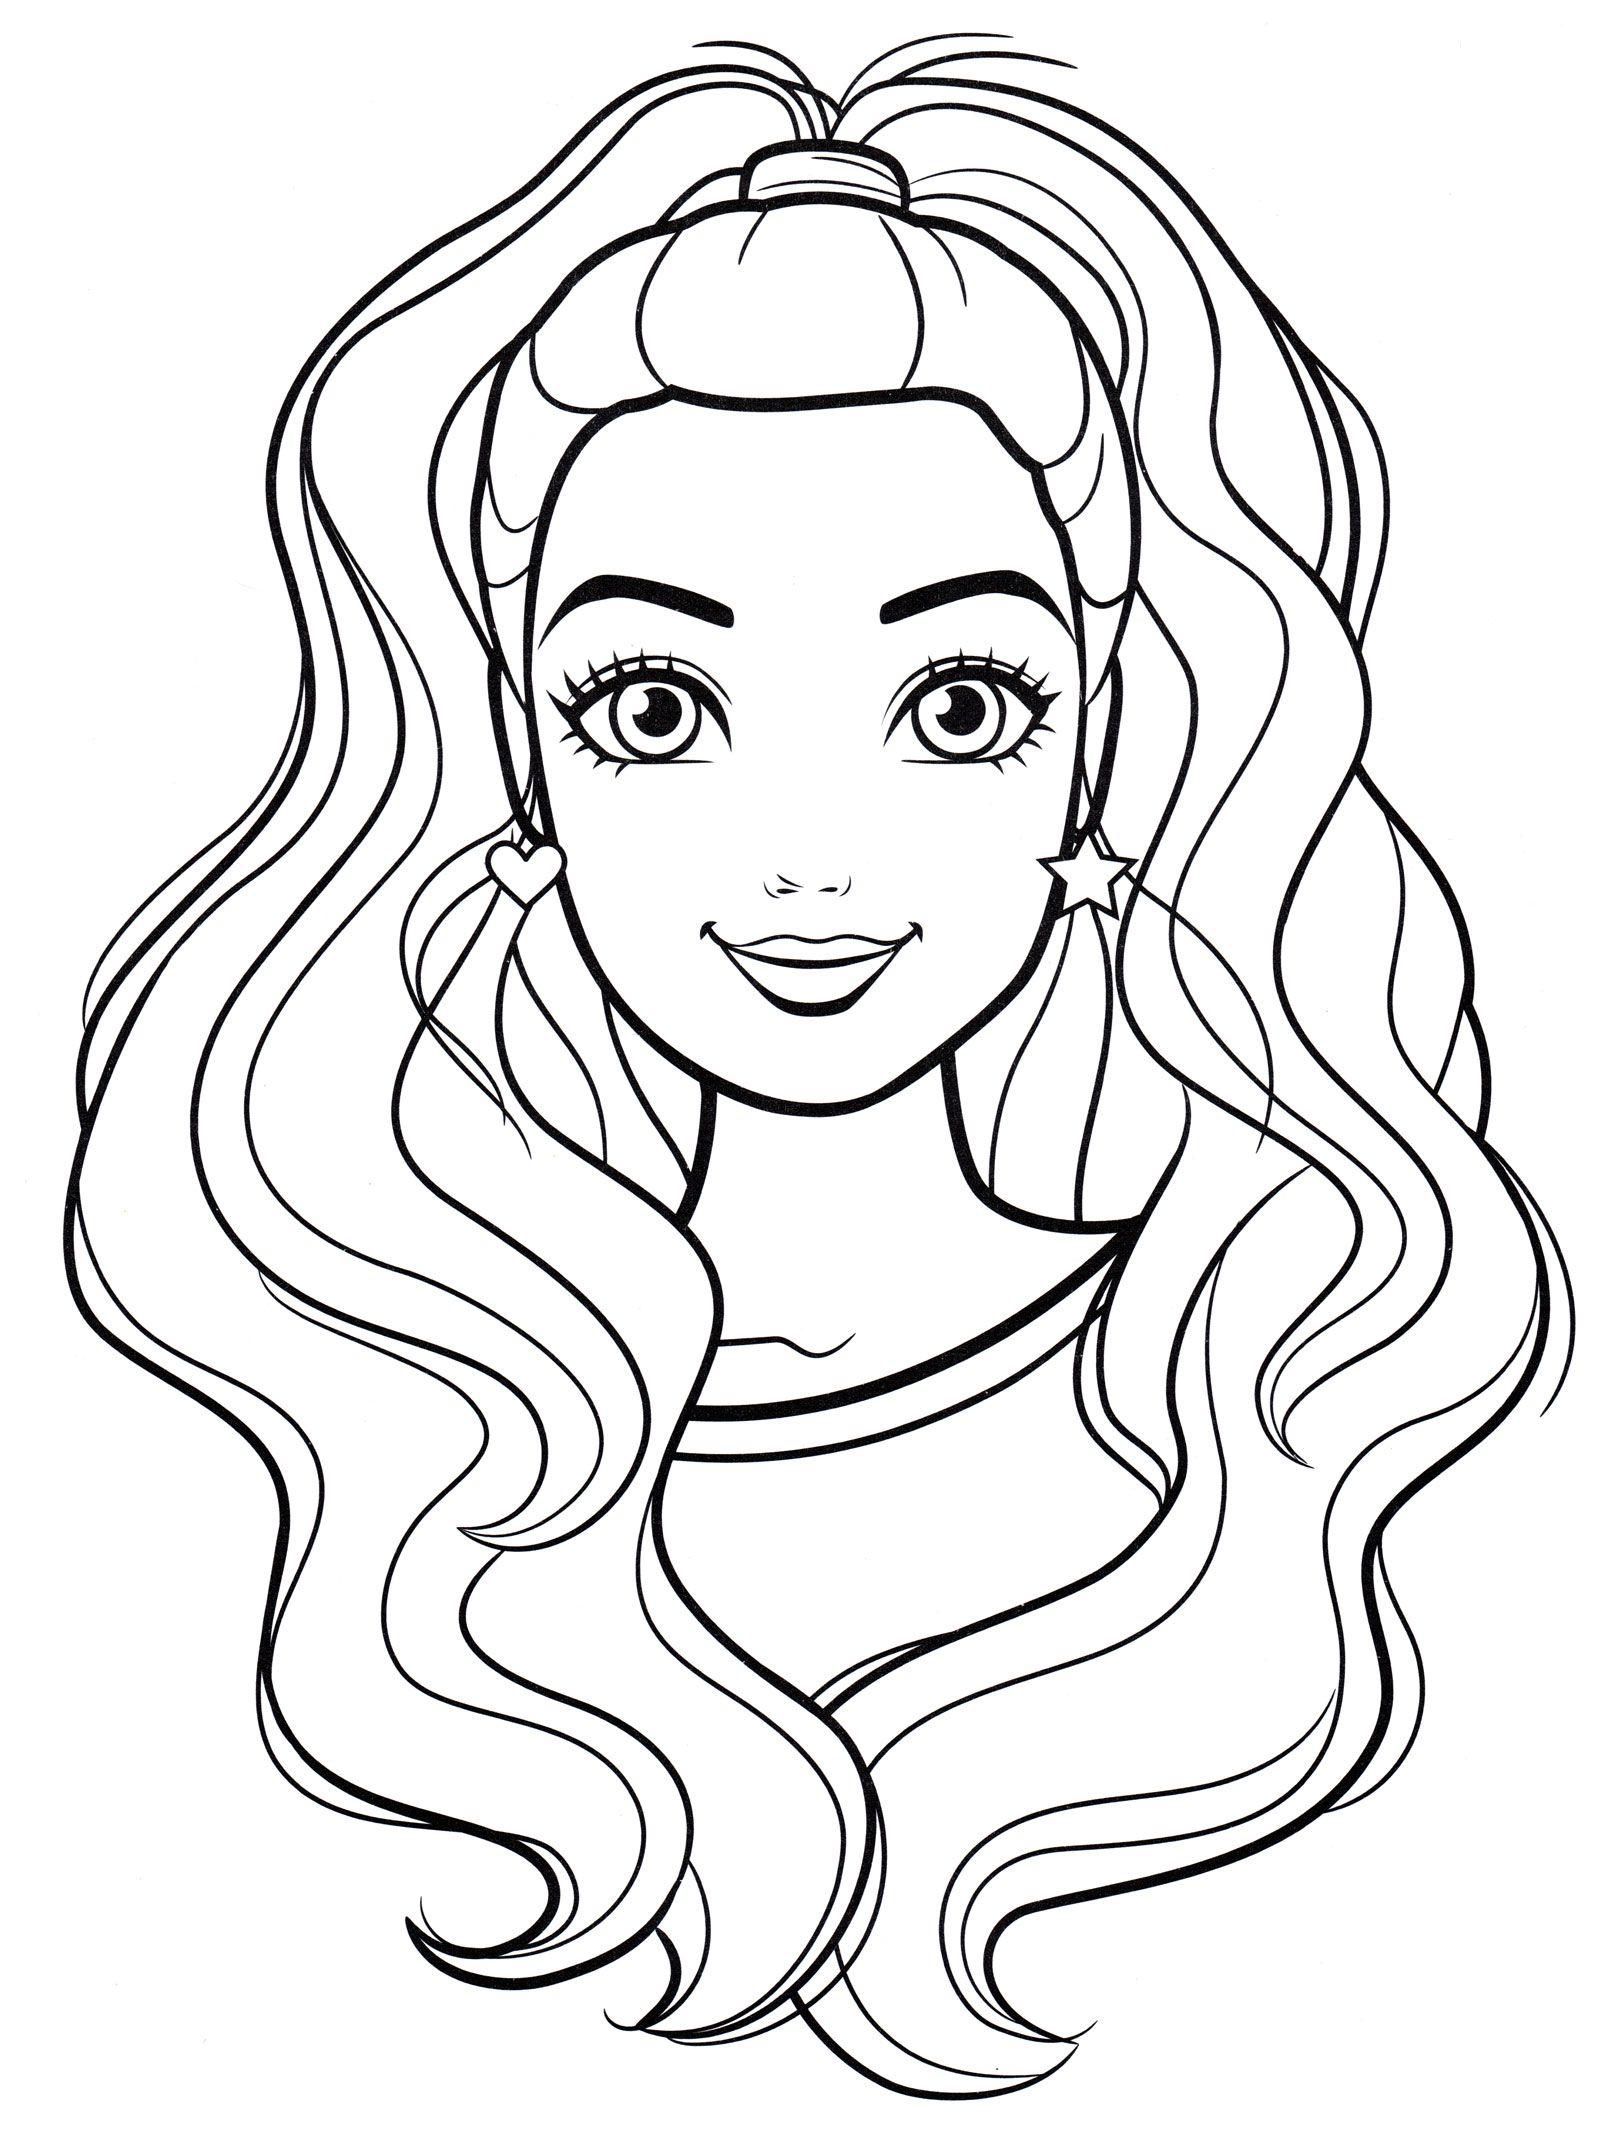 Raskraski Barbi Colorir Barbie Desenhos Para Colorir Barbie Desenhos Pra Colorir